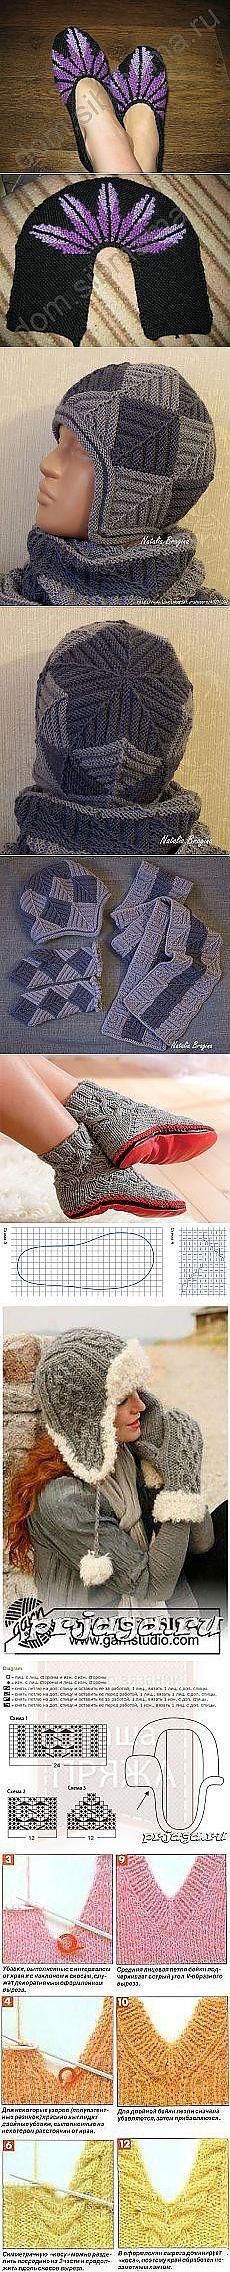 Ольга Богинская: вязание на спицах | Постила.ru [] # # #Kapcie, # #Slippers, # #Scarves, # #Shoes, # #Of #Agujas, # #Tissues, # #Patterns